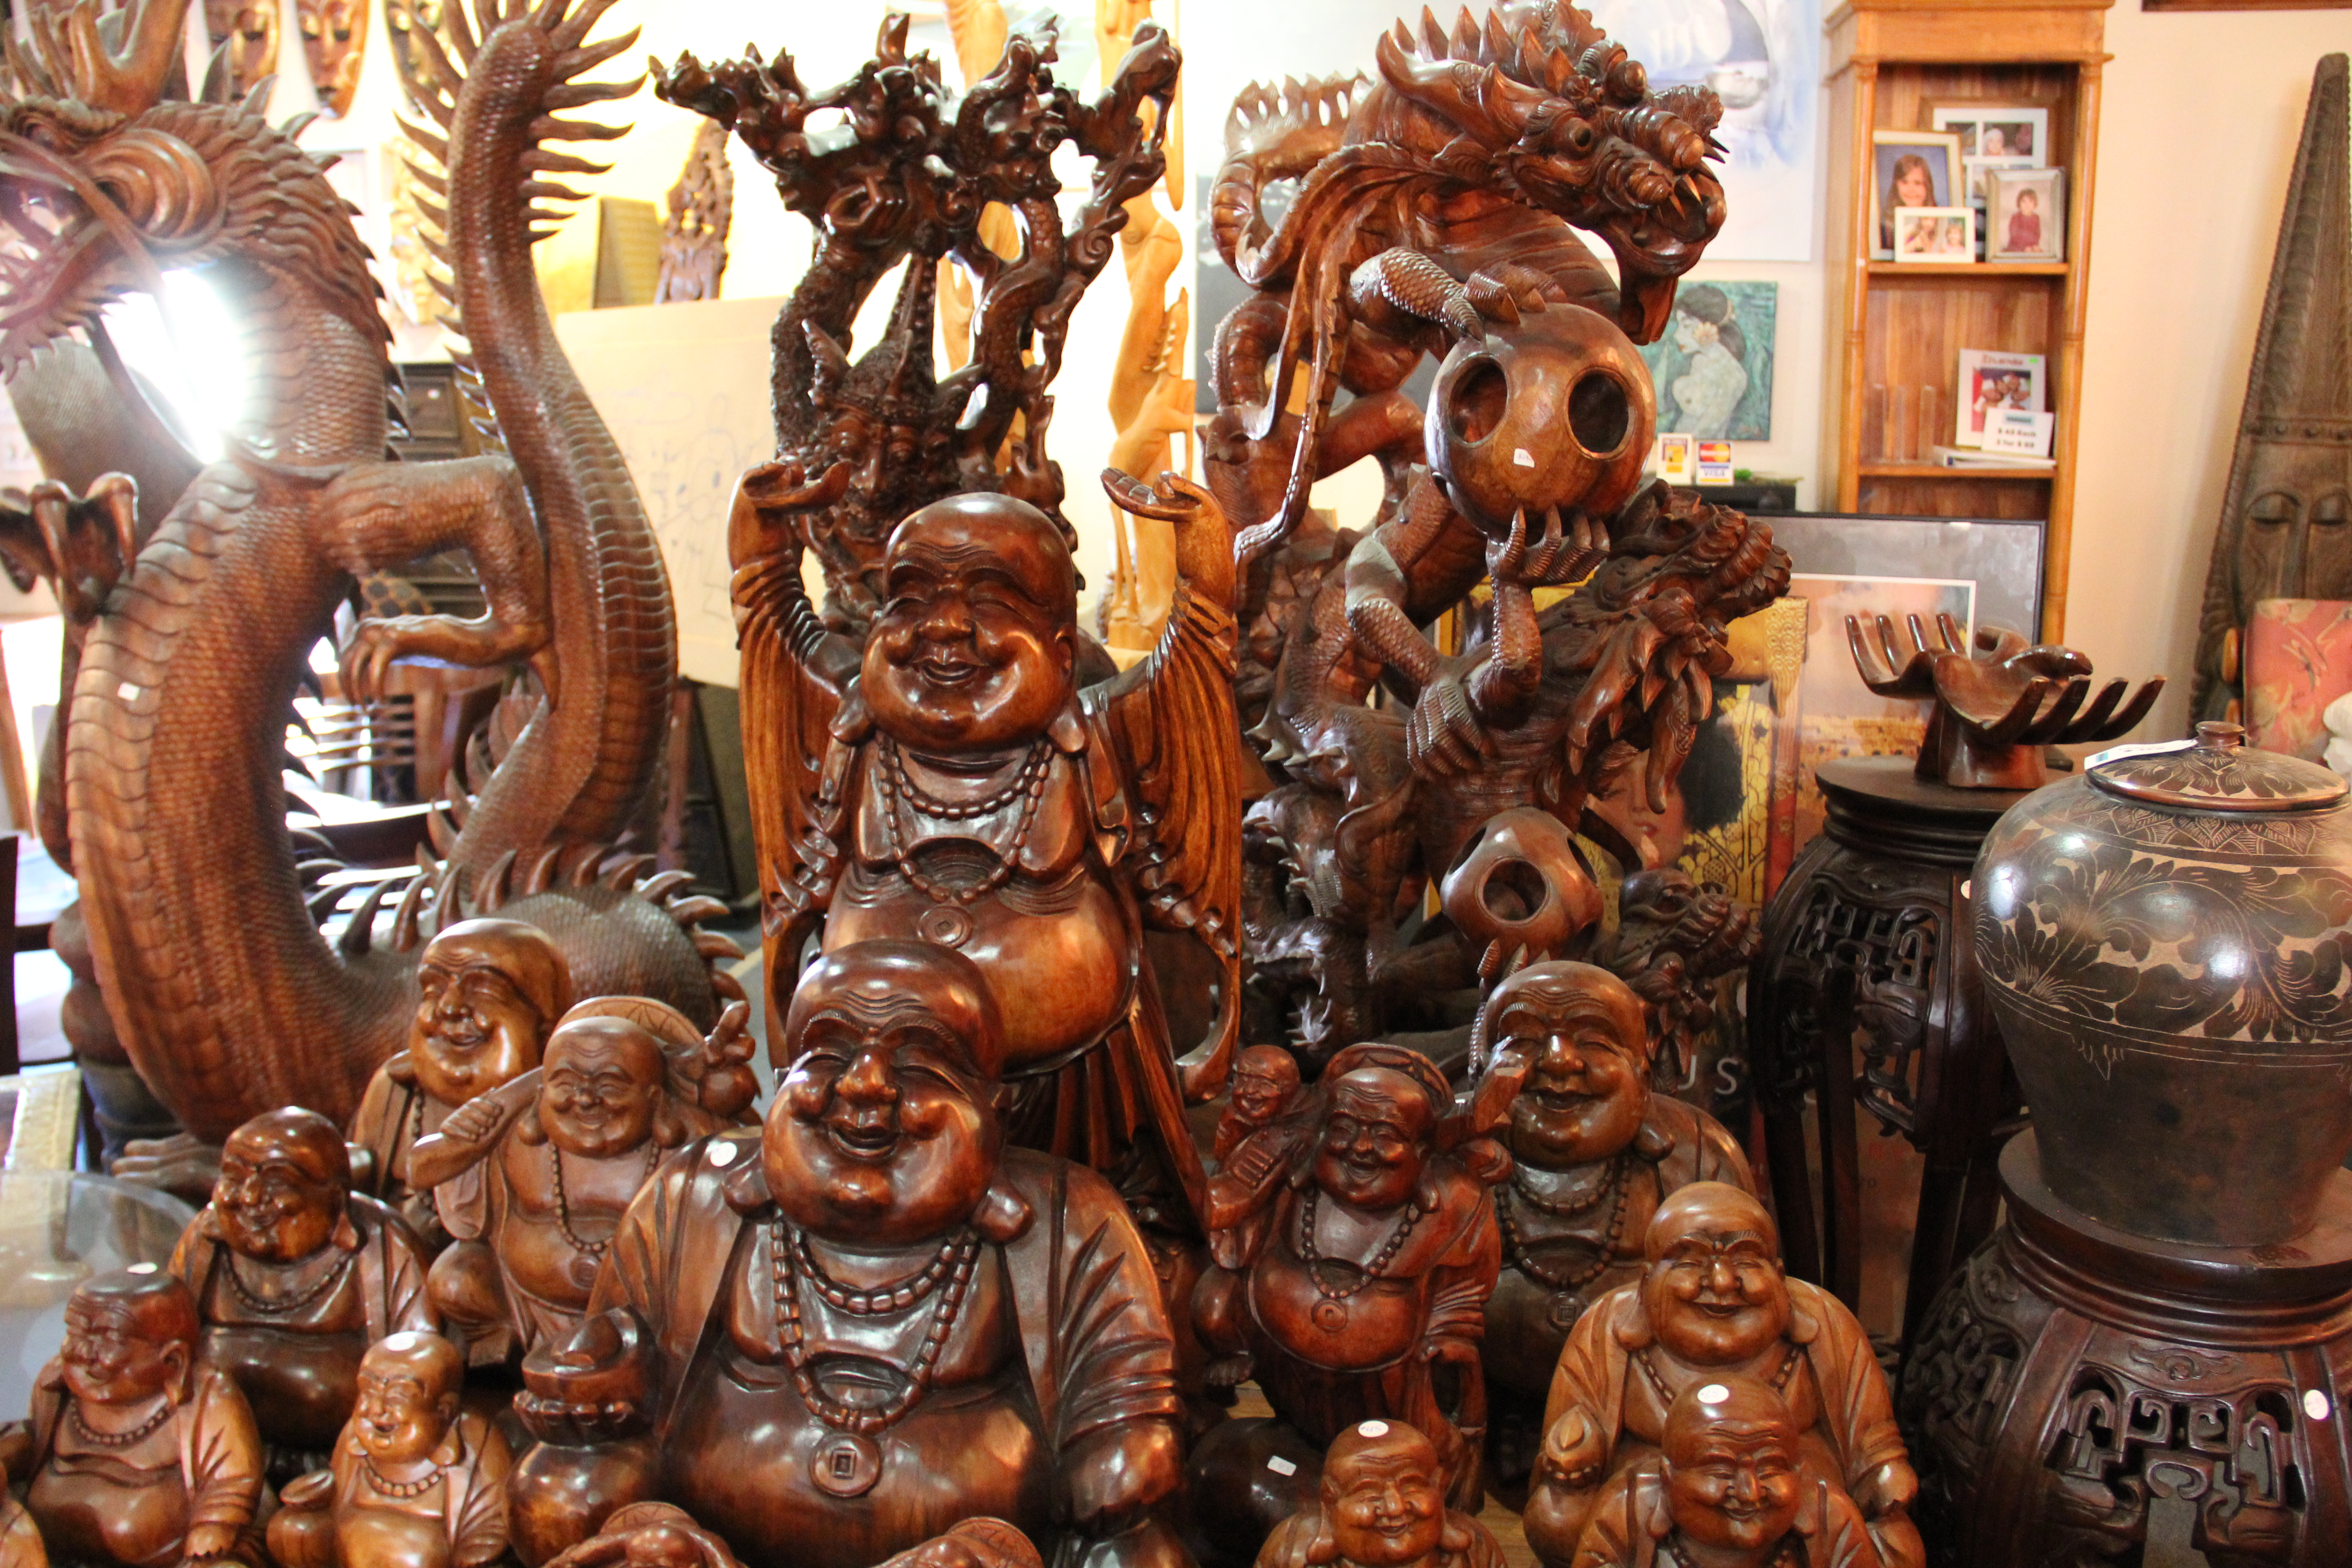 Assortment of Buddha Figures